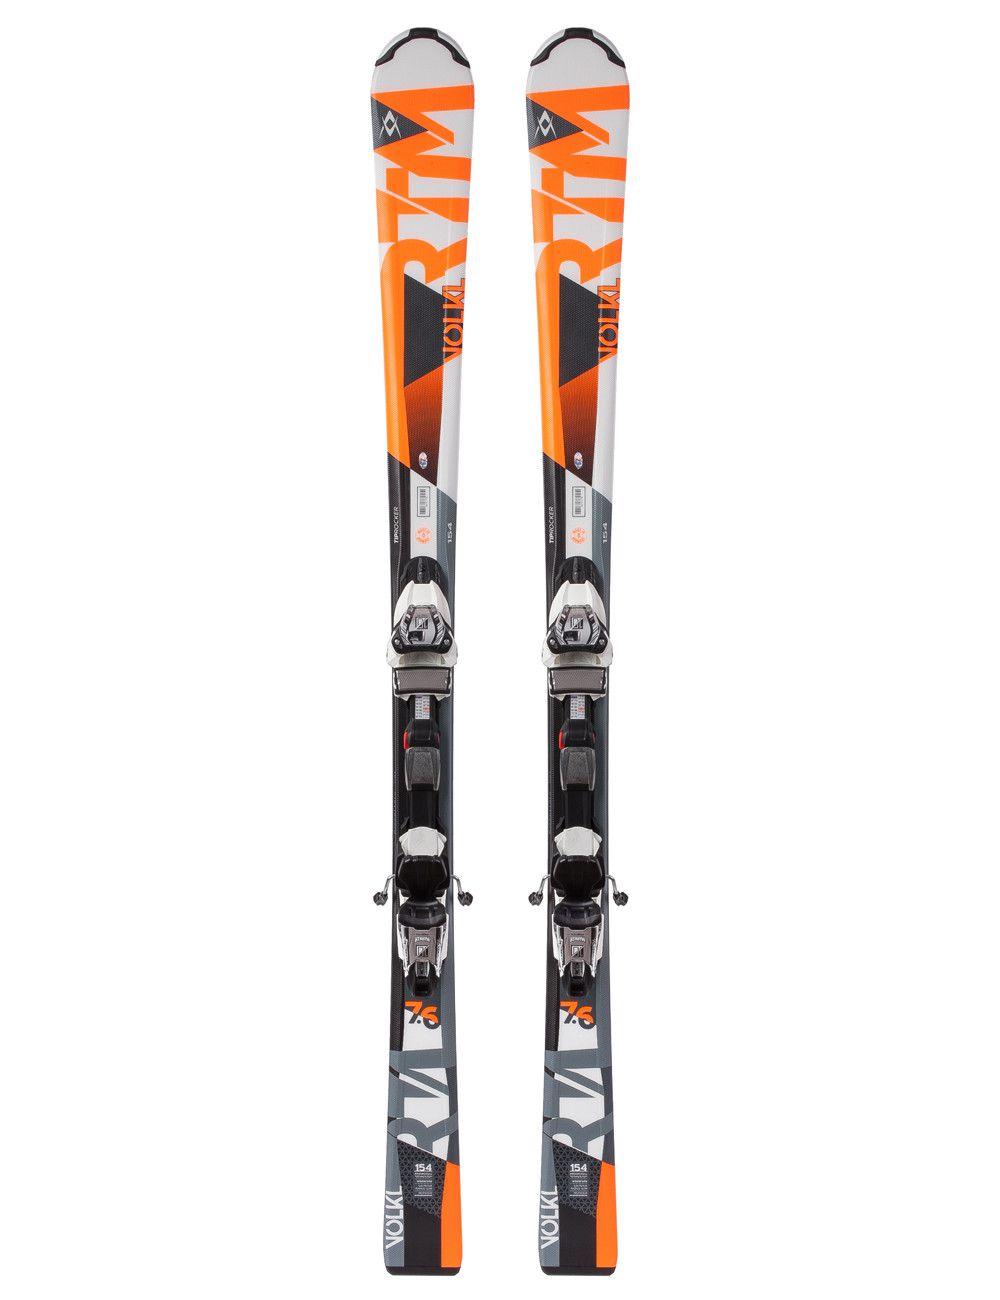 Лыжи Volkl RTM 7.6 + Marker 10.0 Fastrak, длина 168см